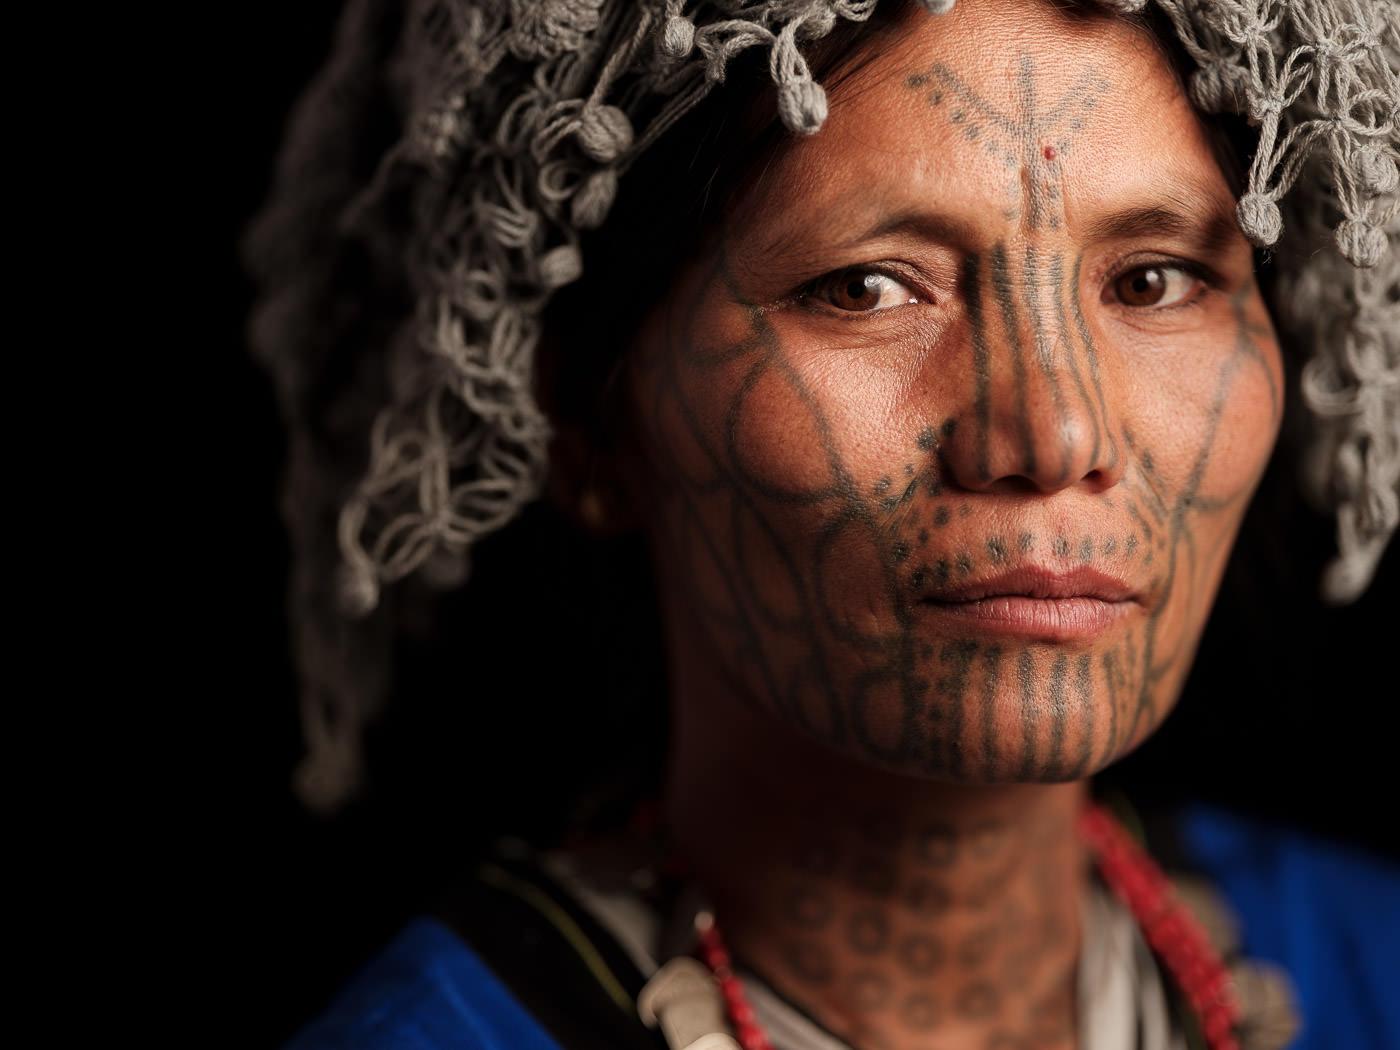 Mun Chin Woman Tattoo - Myanmar